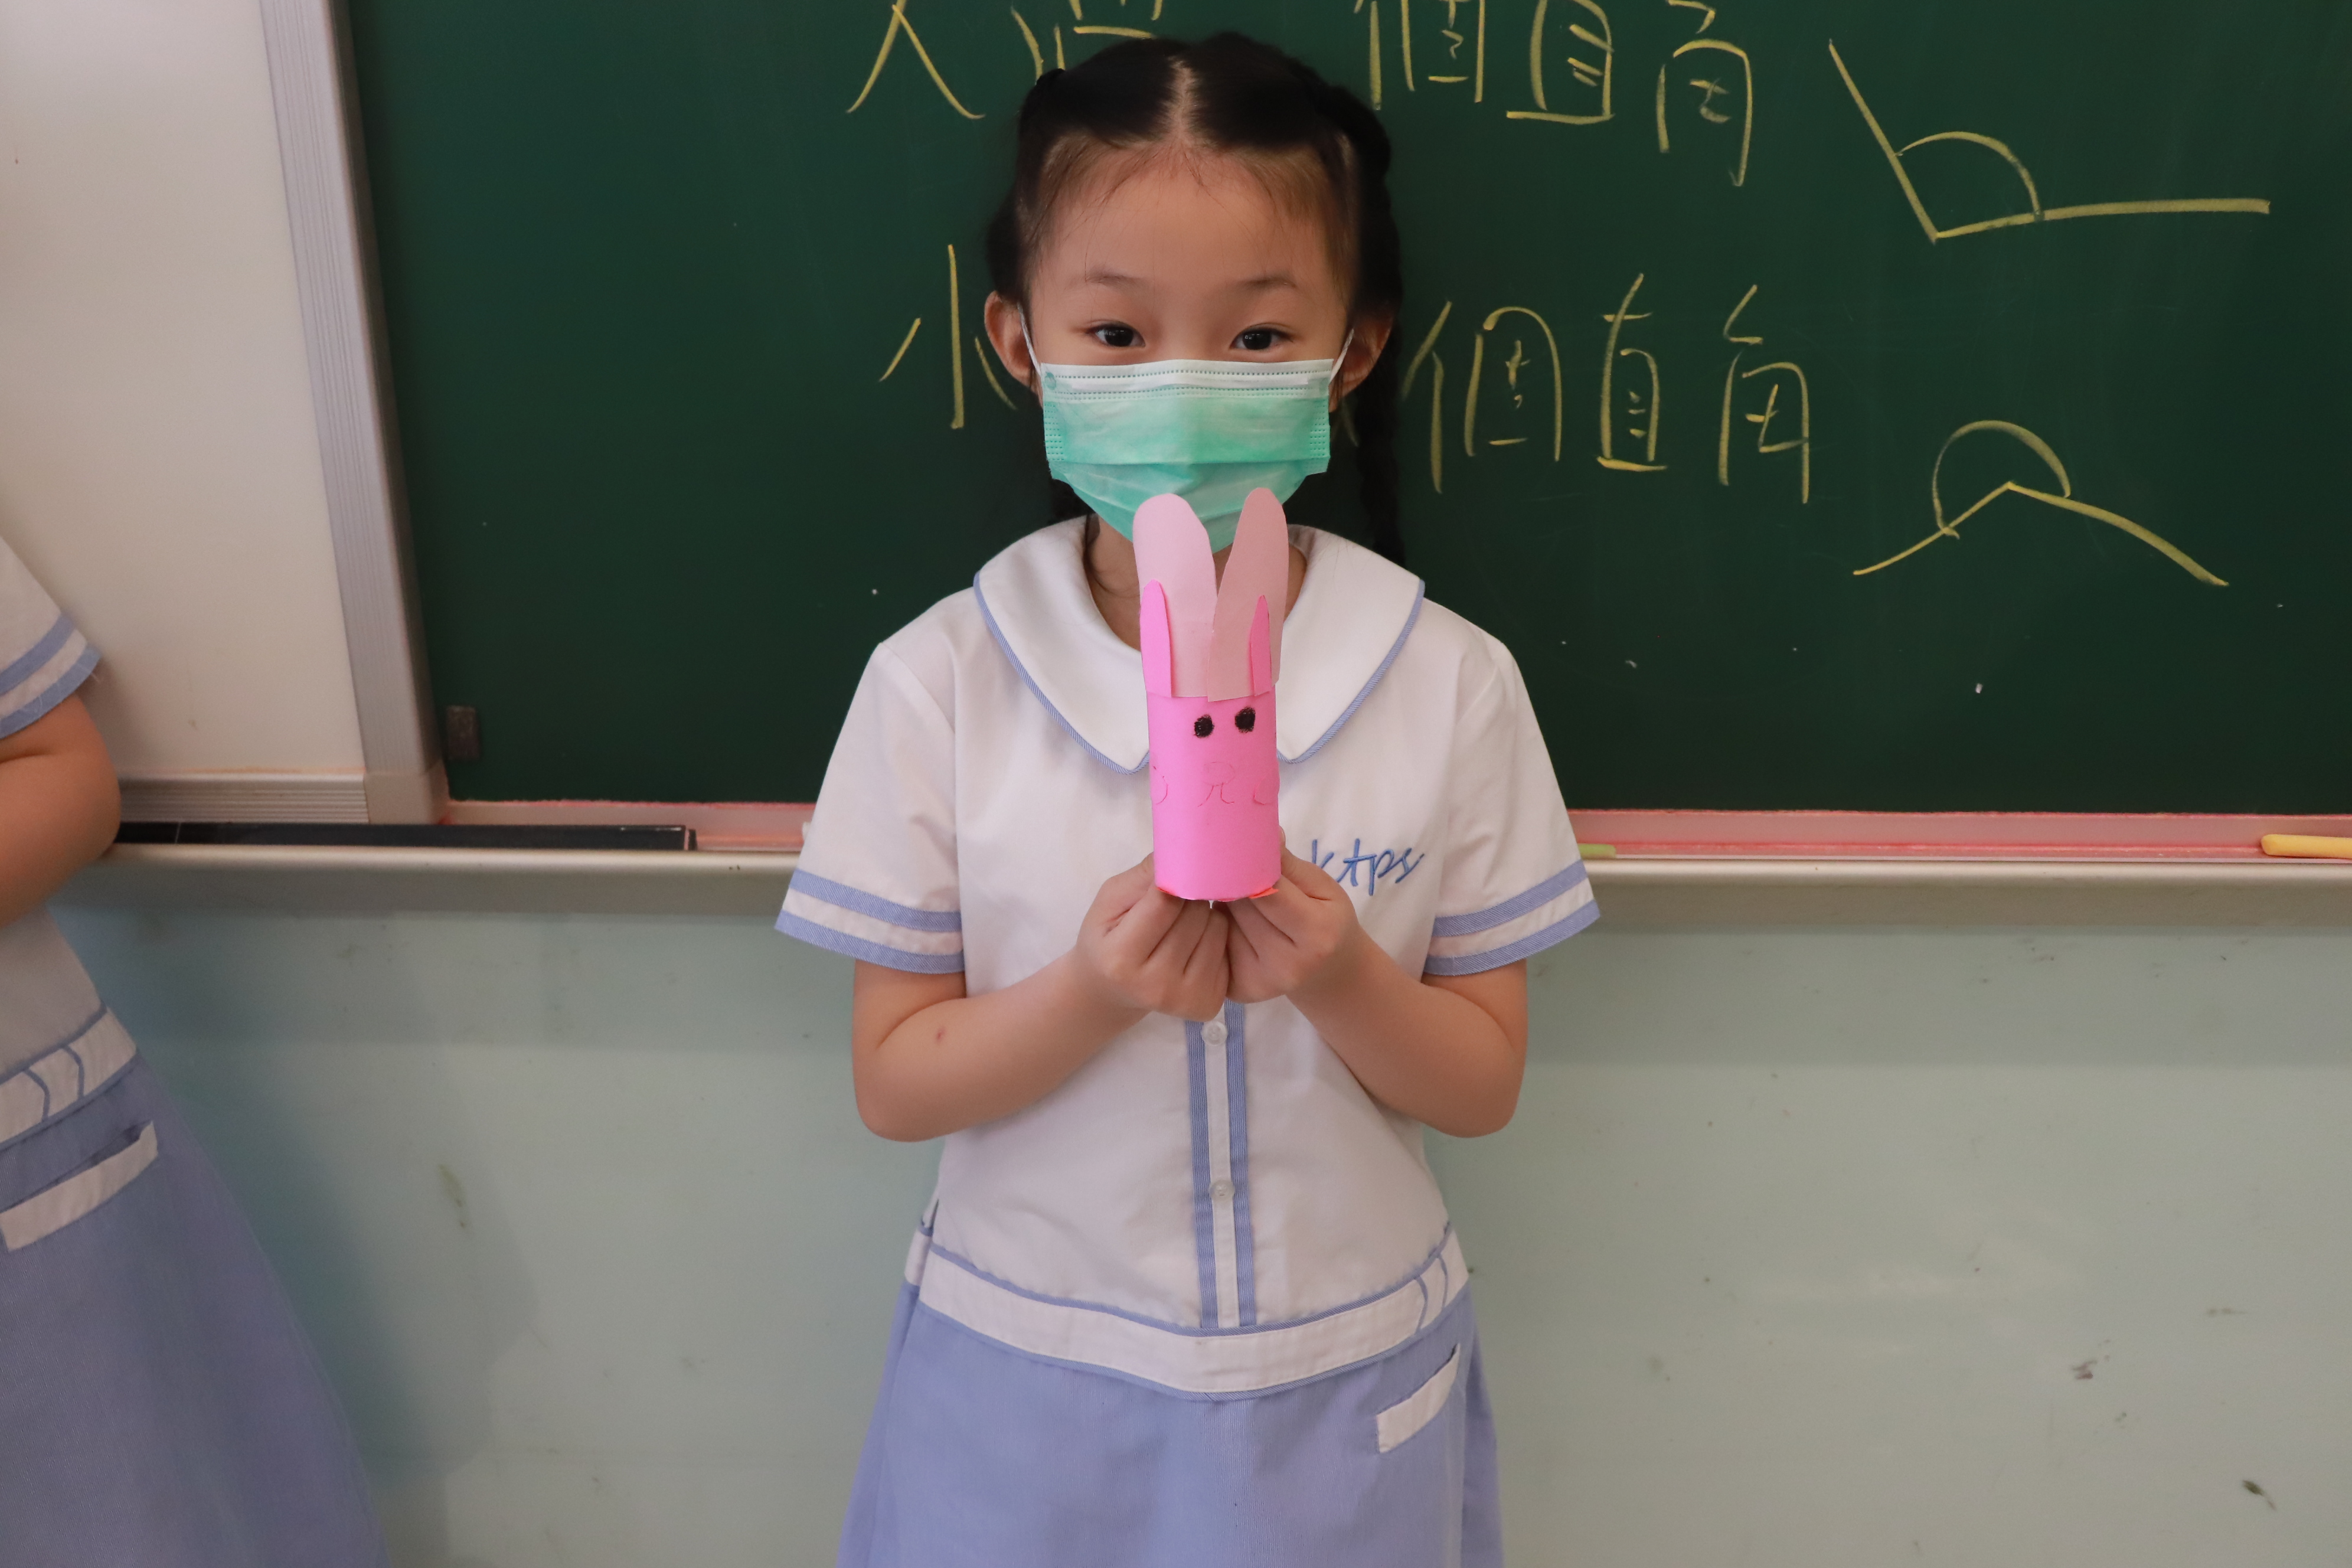 http://keito.school.hk/sites/default/files/img_6795.jpg